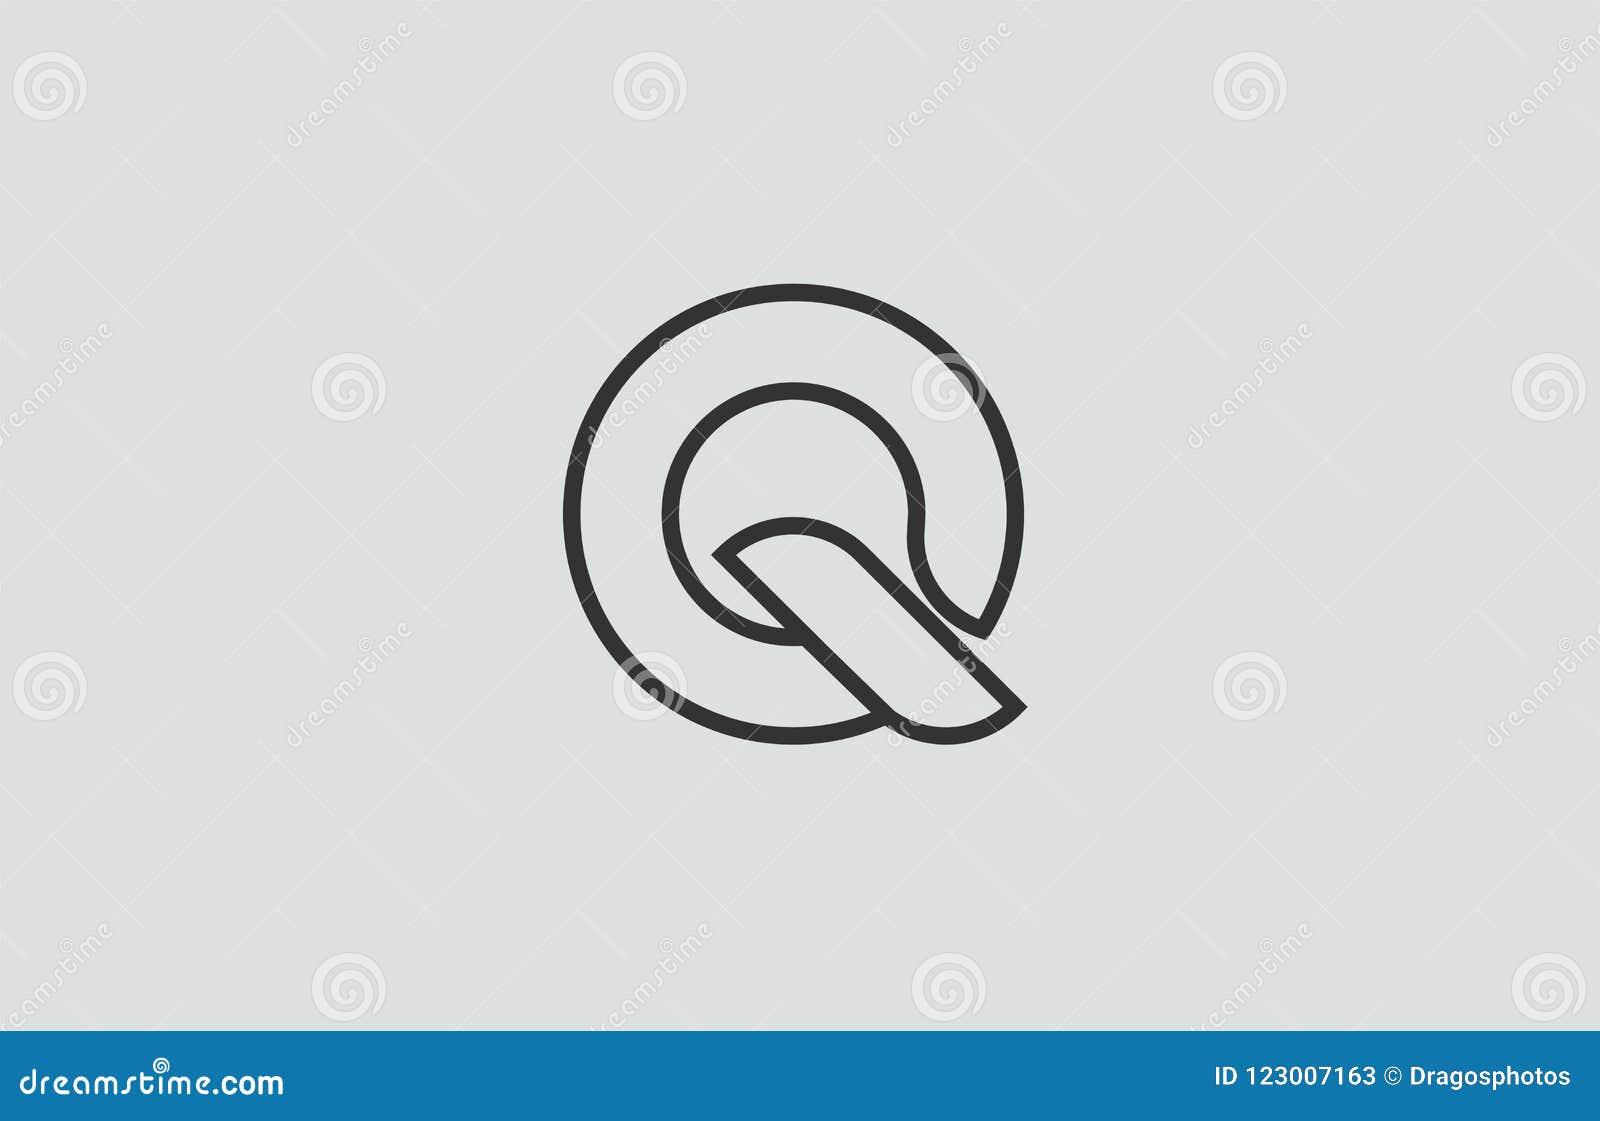 Black And White Alphabet Letter Q Logo Icon Design Stock Vector